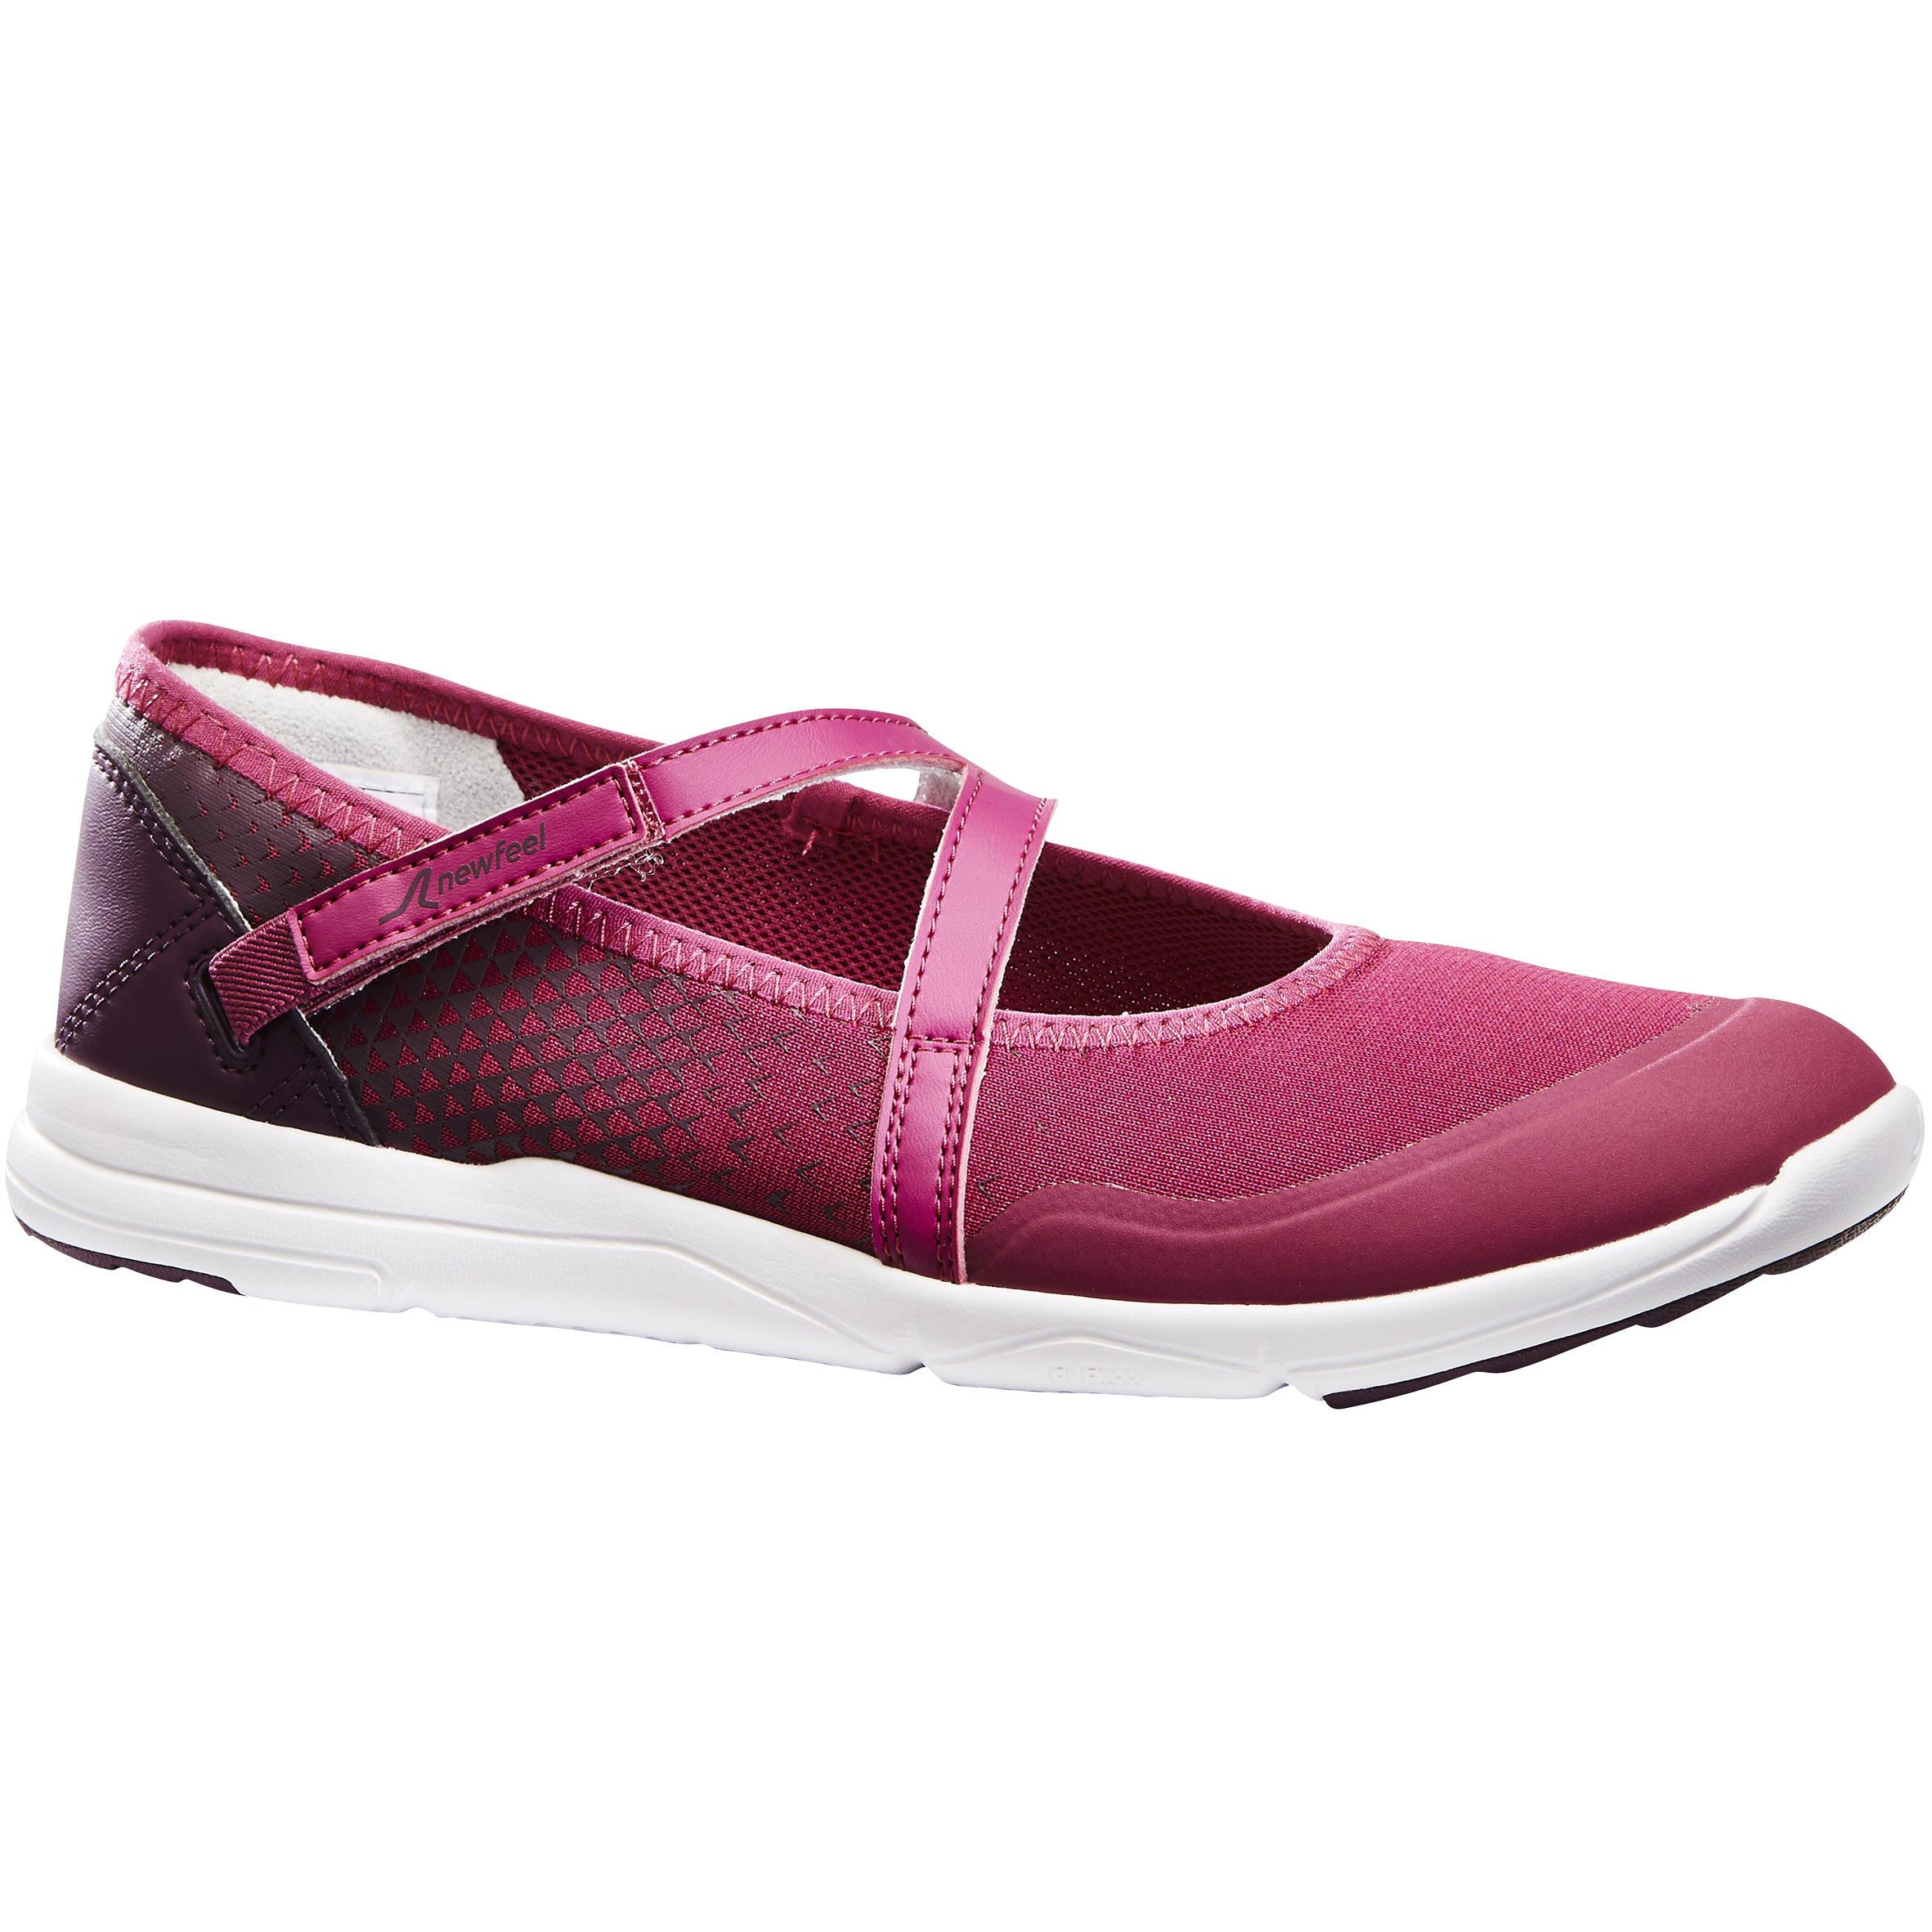 decathlon shoes ladies shopping 01036 83e56